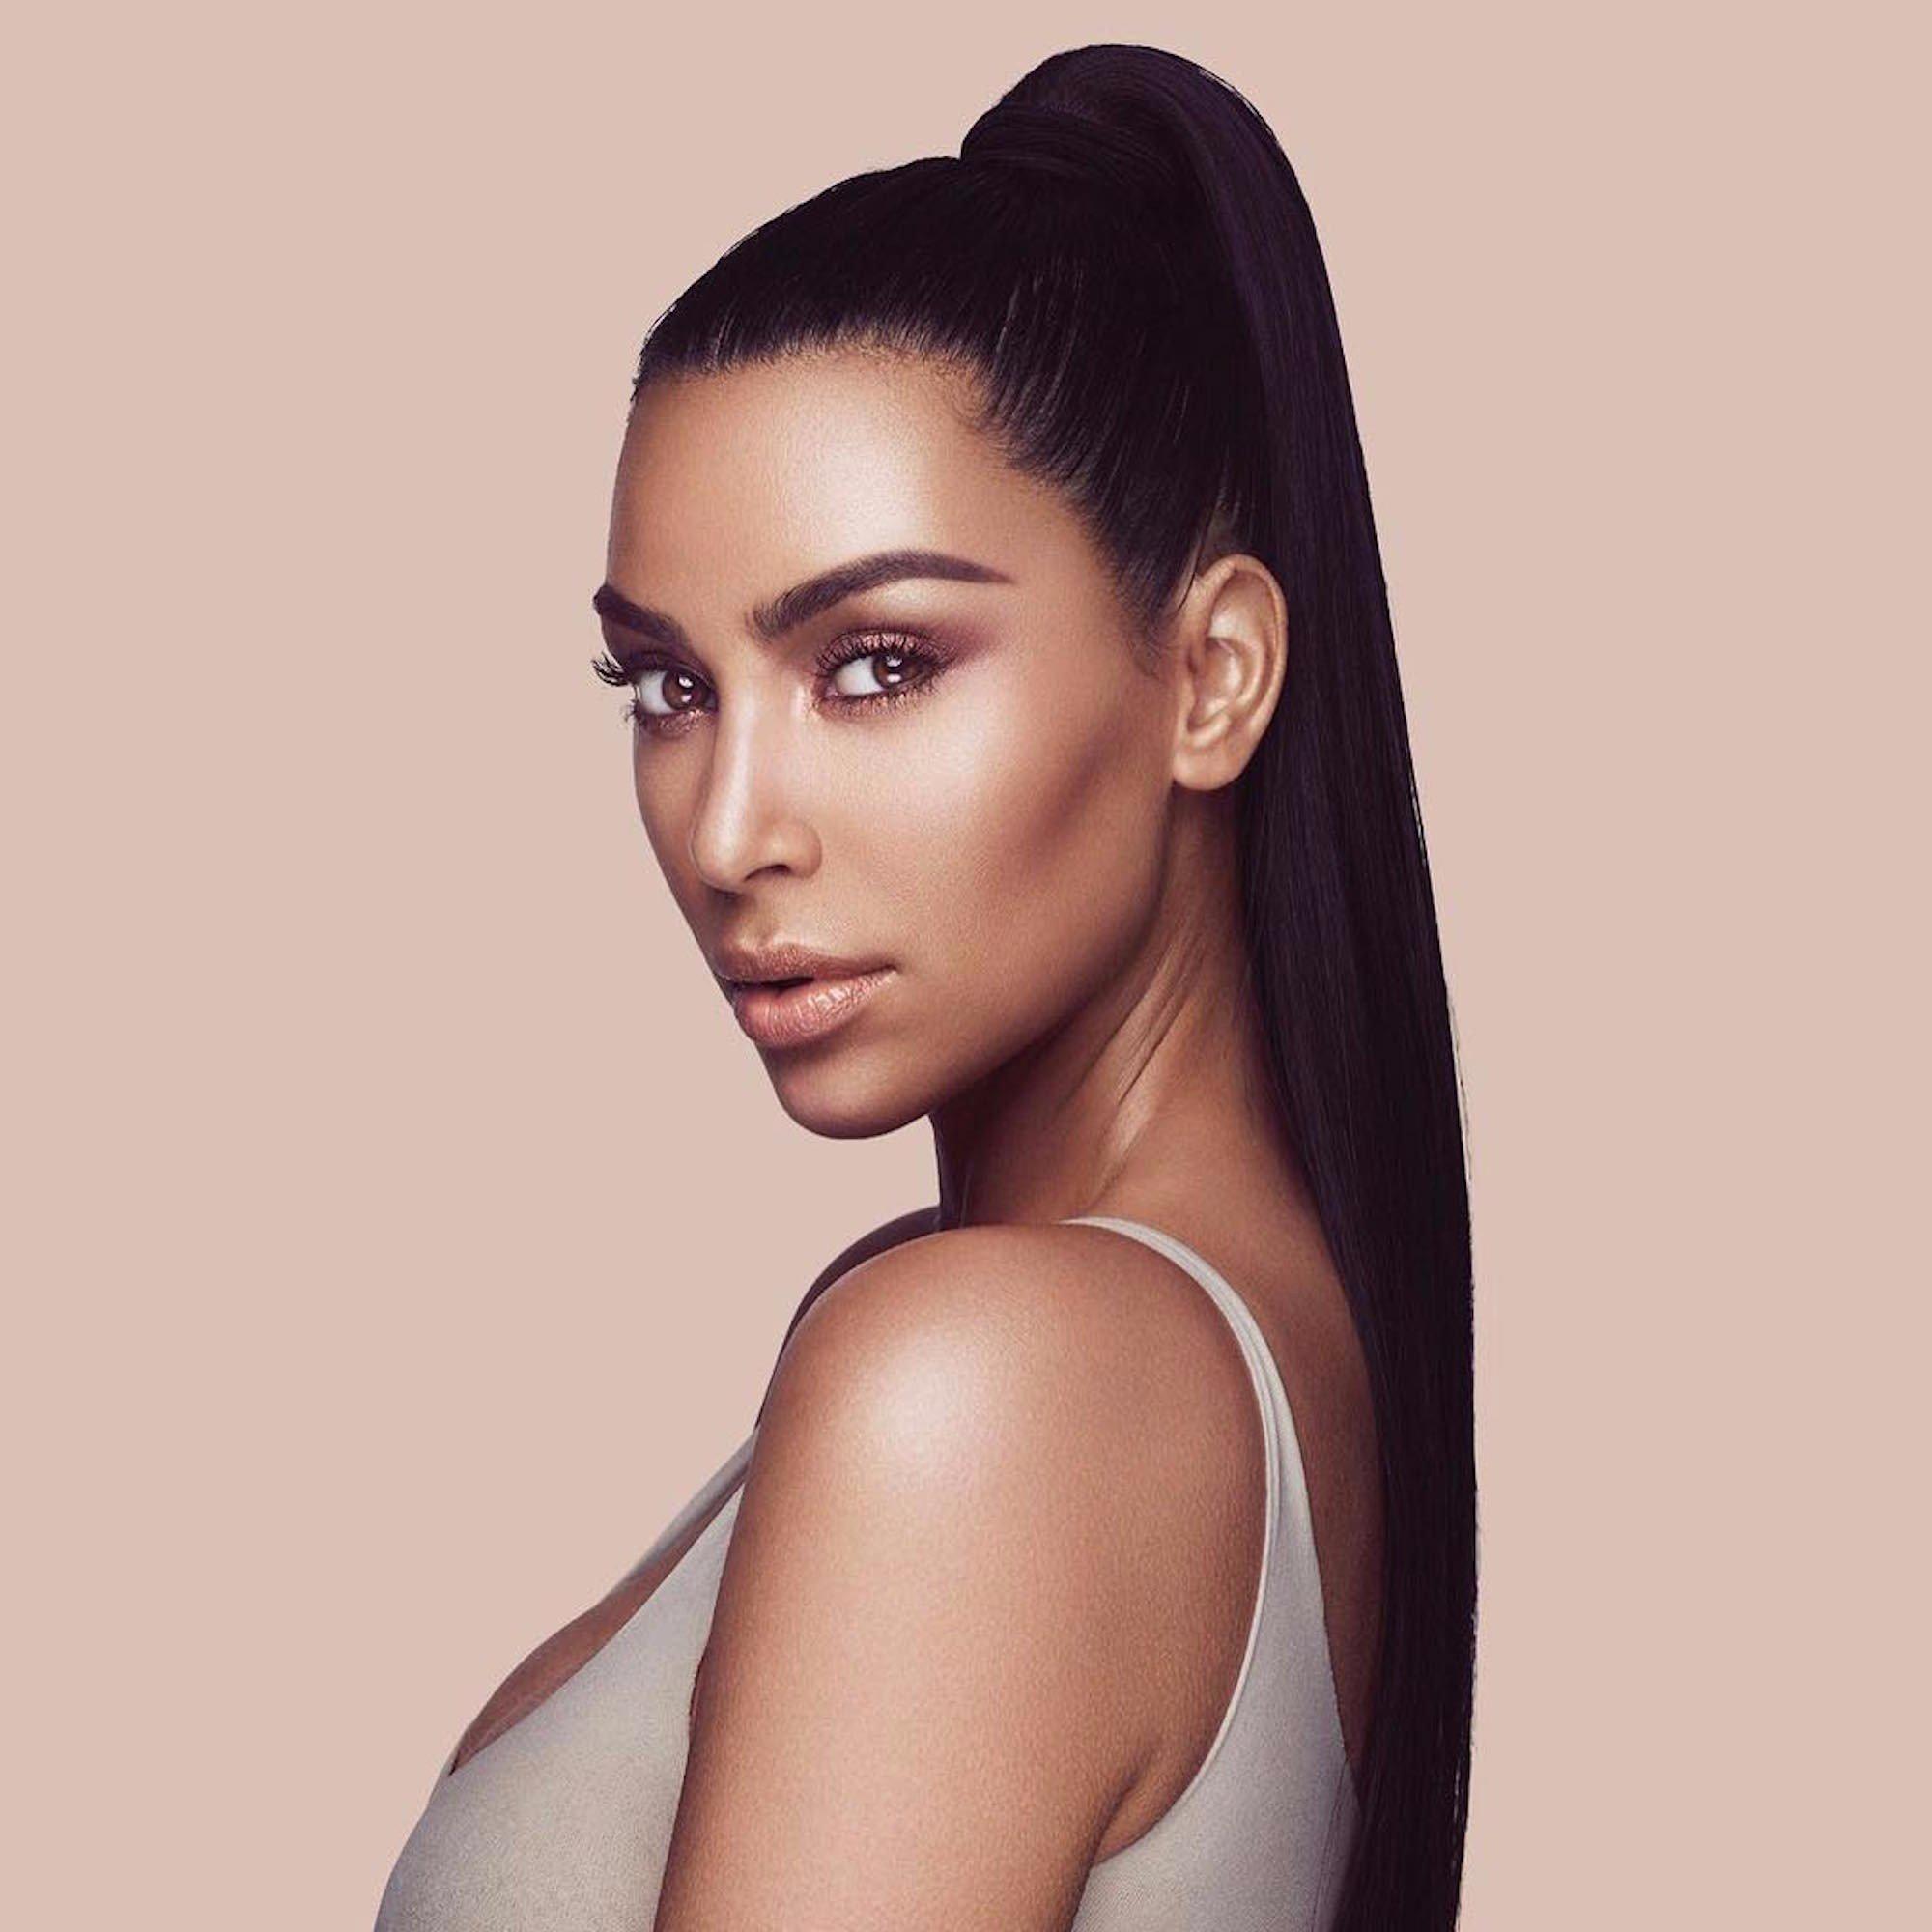 Kkw Beauty: Kim Kardashian To Launch A New Perfume Under The KKW